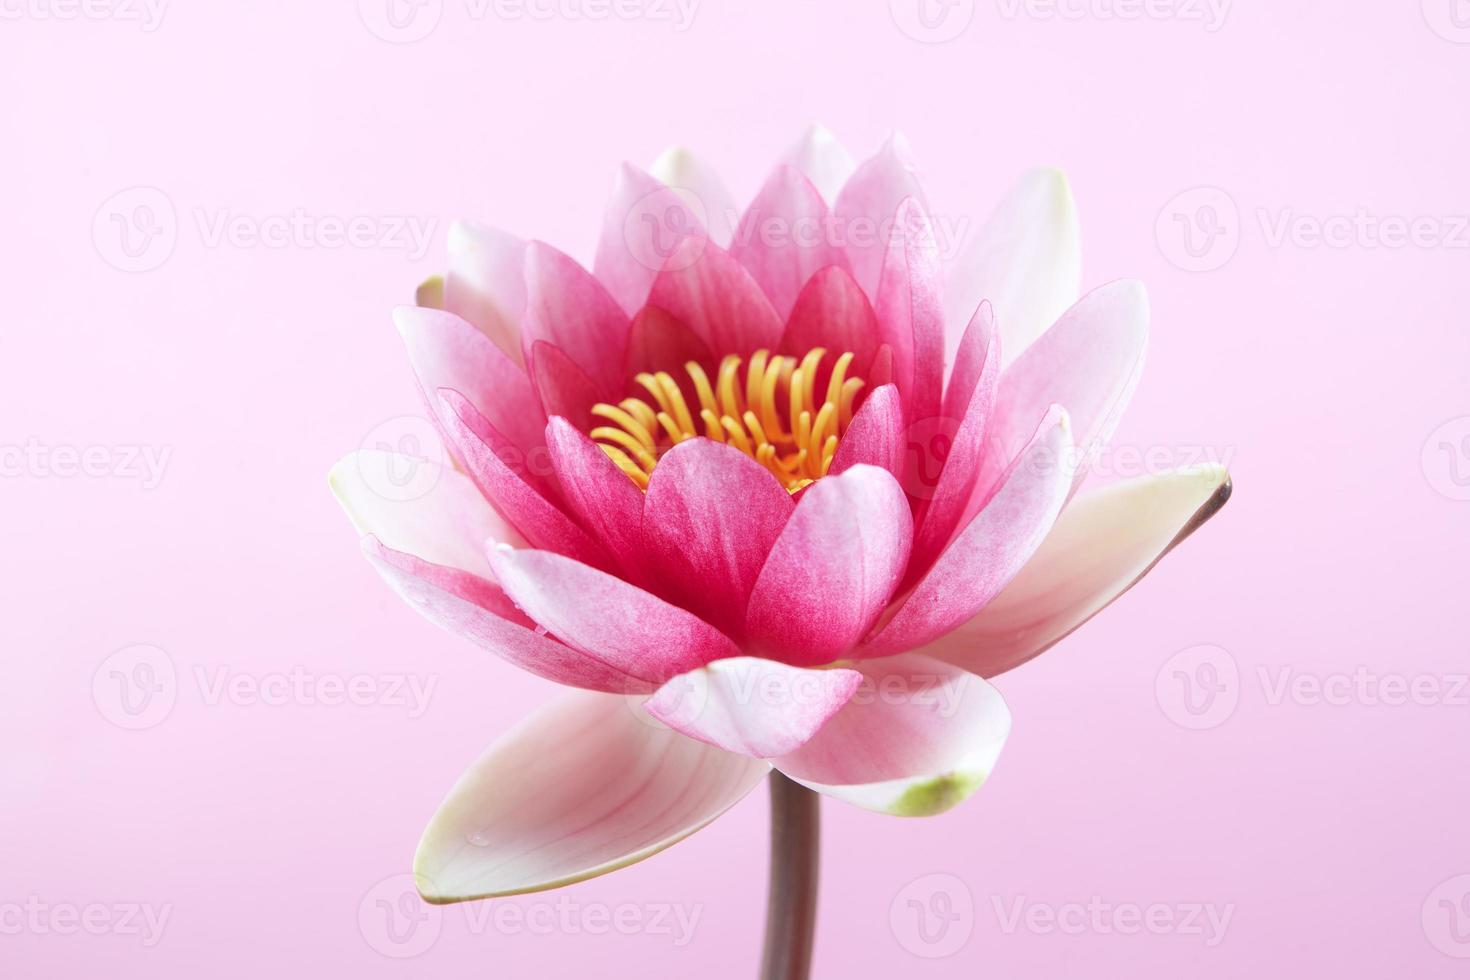 lírio d'água, lótus rosa foto